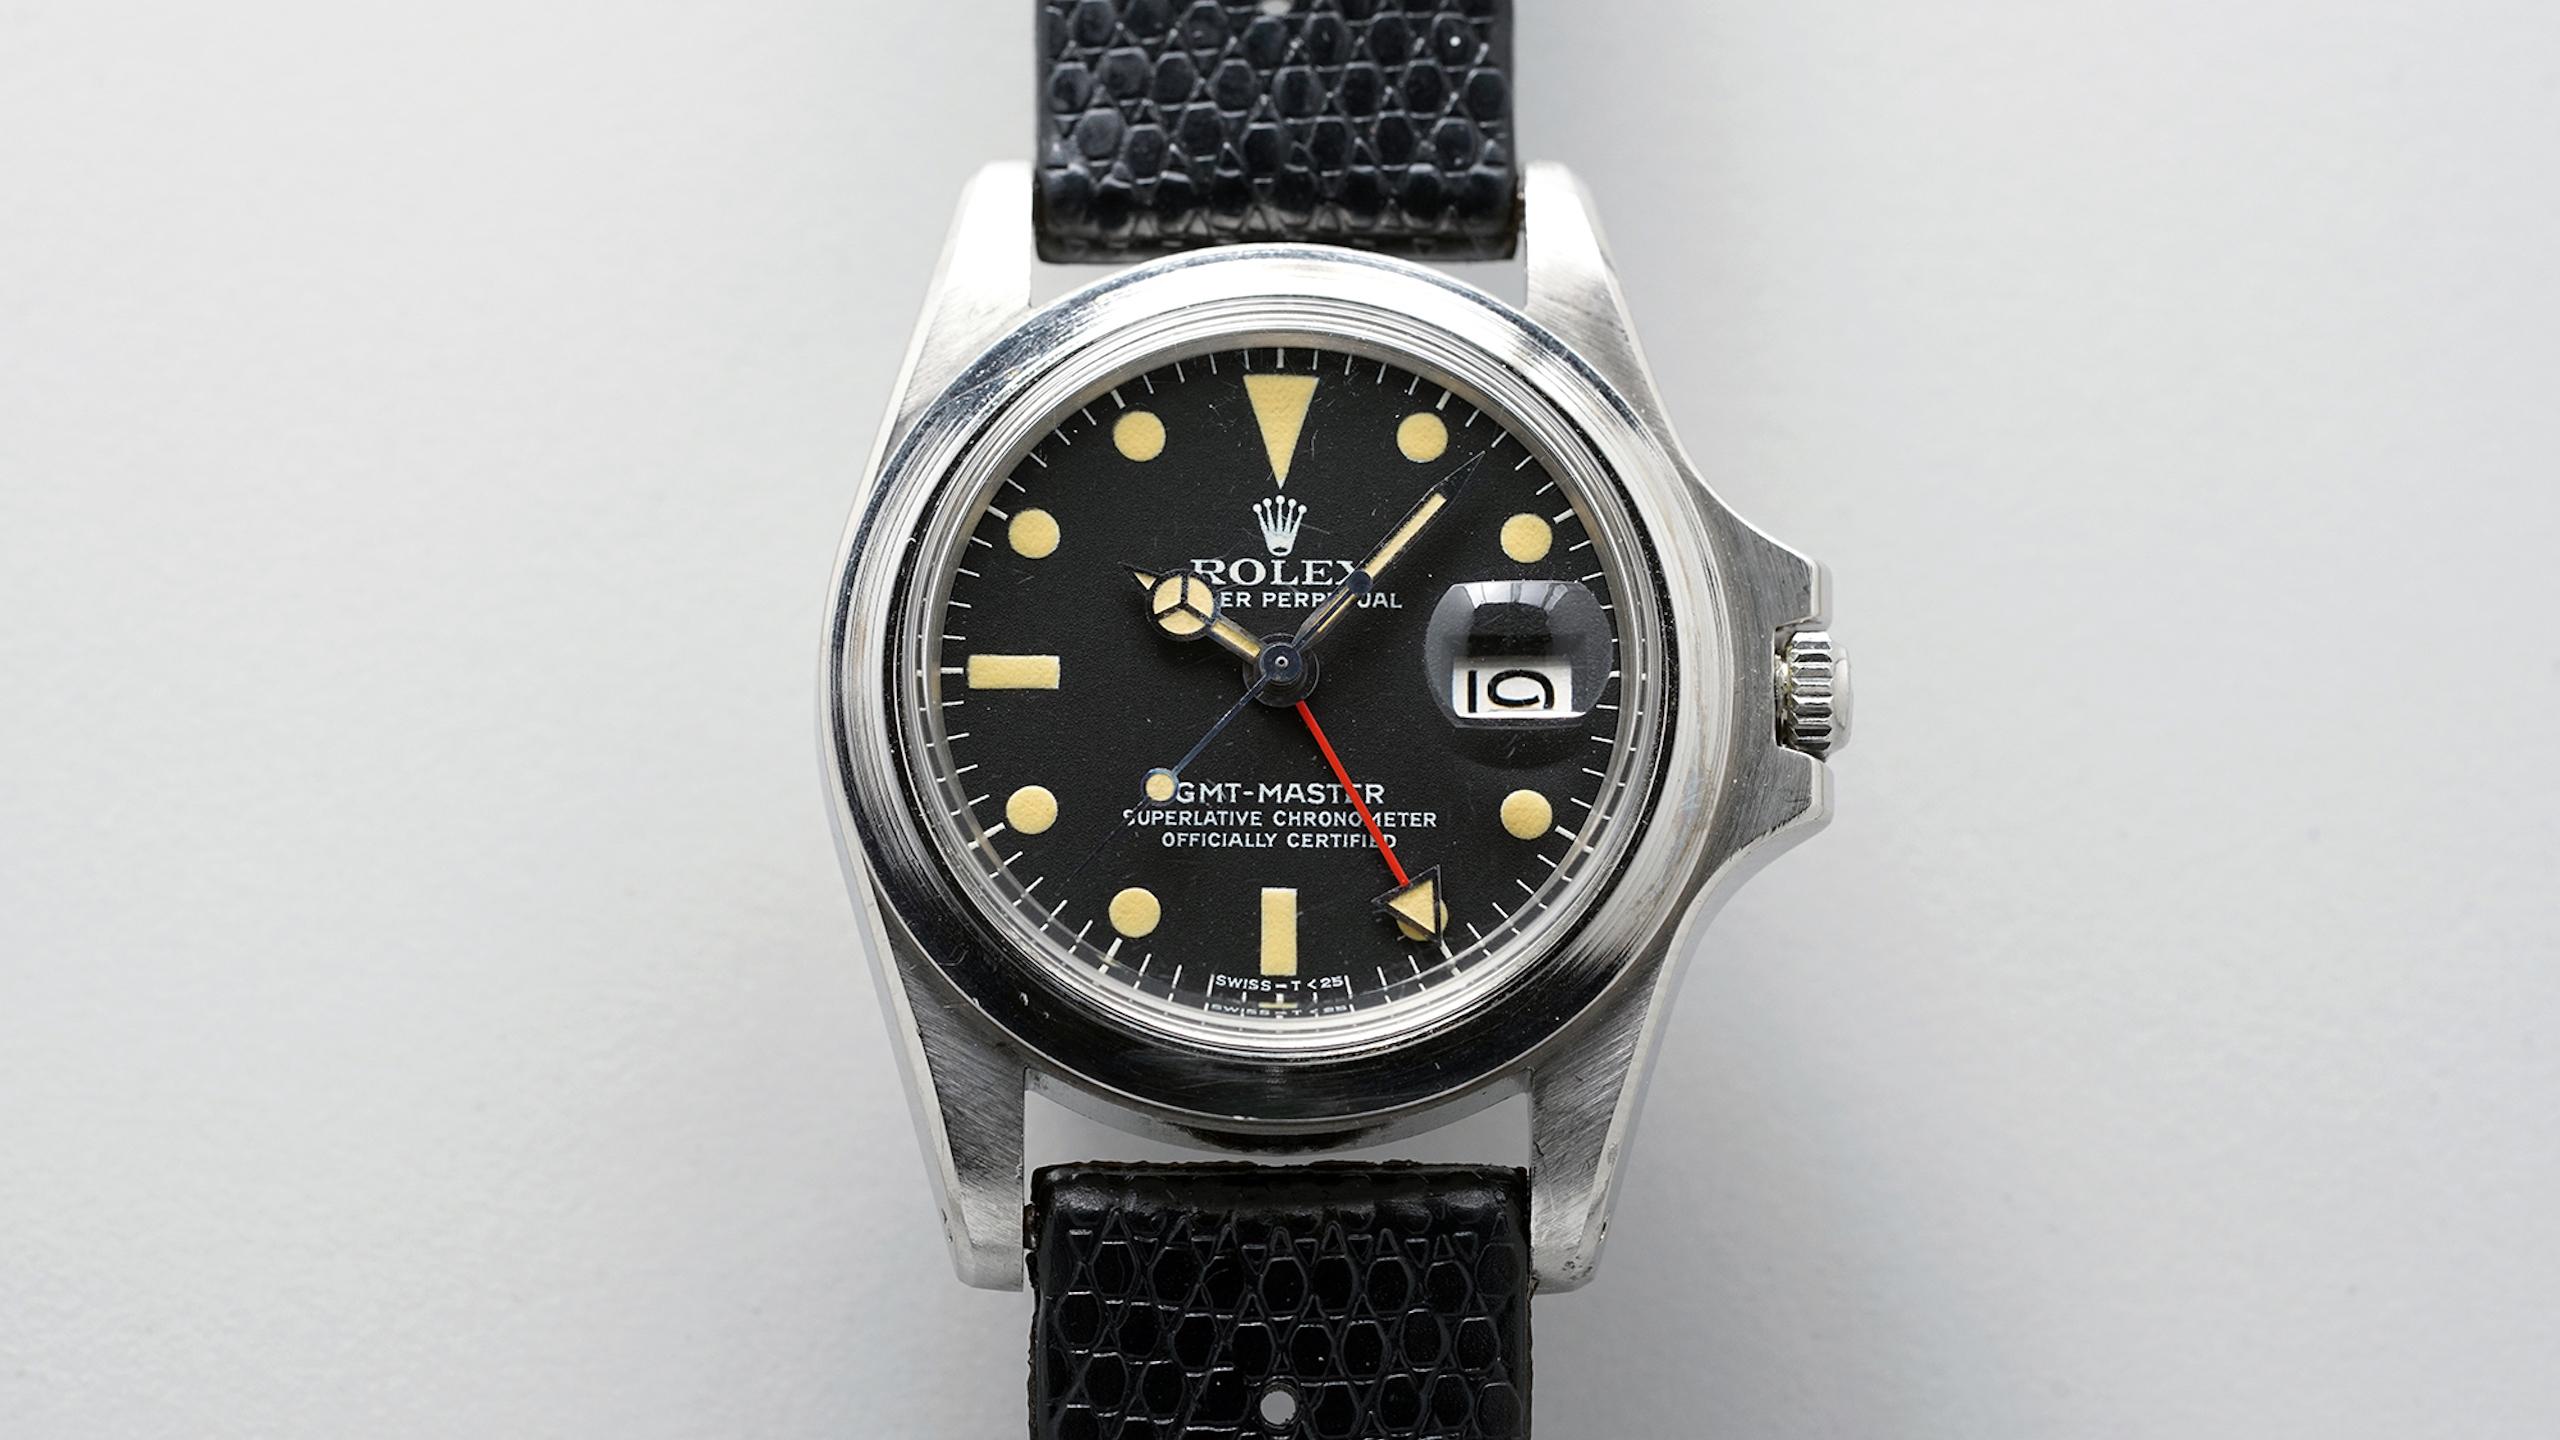 Marlon Brando's Rolex GMT-Master from 'Apocalypse Now' resurfaces